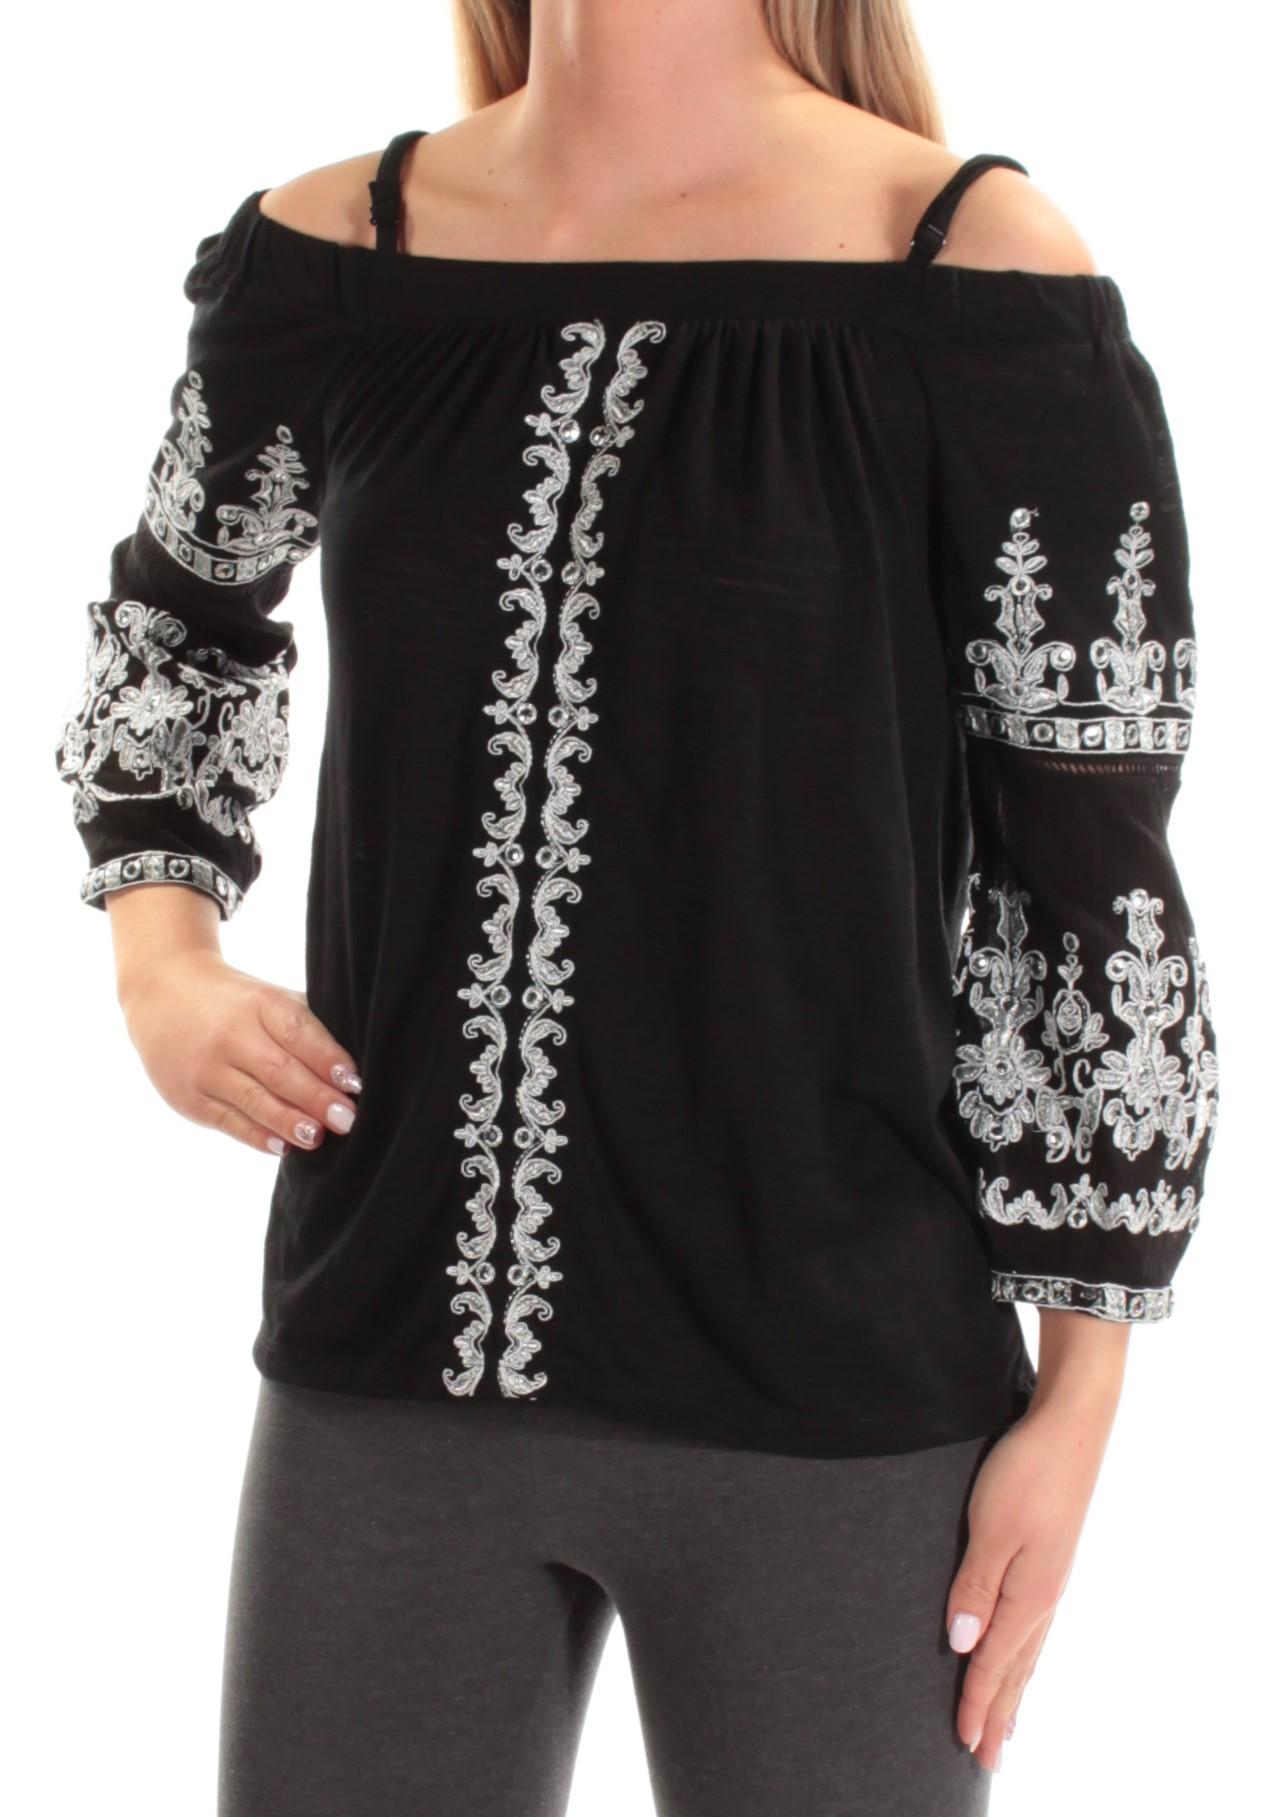 INC Womens Silver Cold Shoulder Embroidered Rhinestone Spaghetti Strap Square Neck Top Petites  Size: S